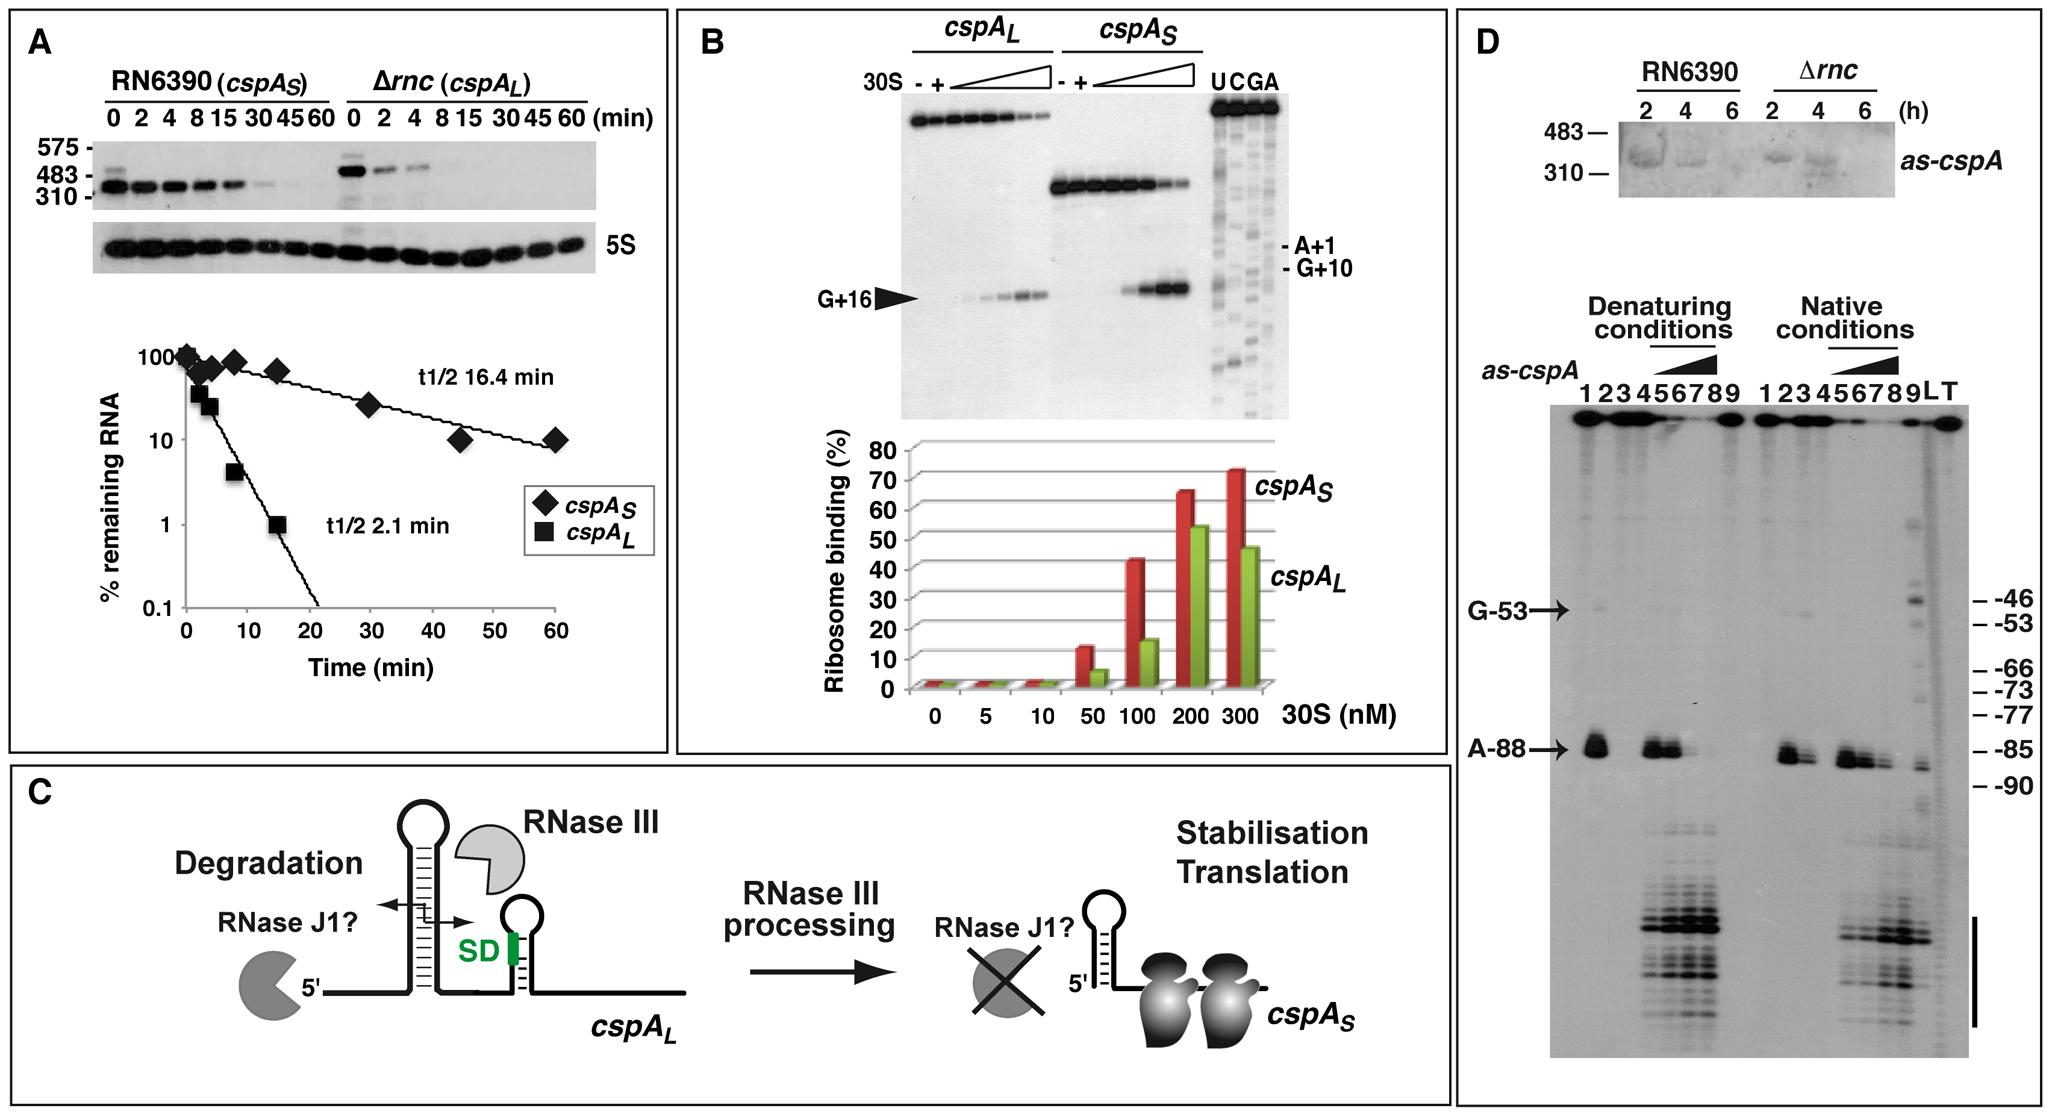 RNase III–dependent processing stabilizes <i>cspA</i> mRNA and enhances translation.